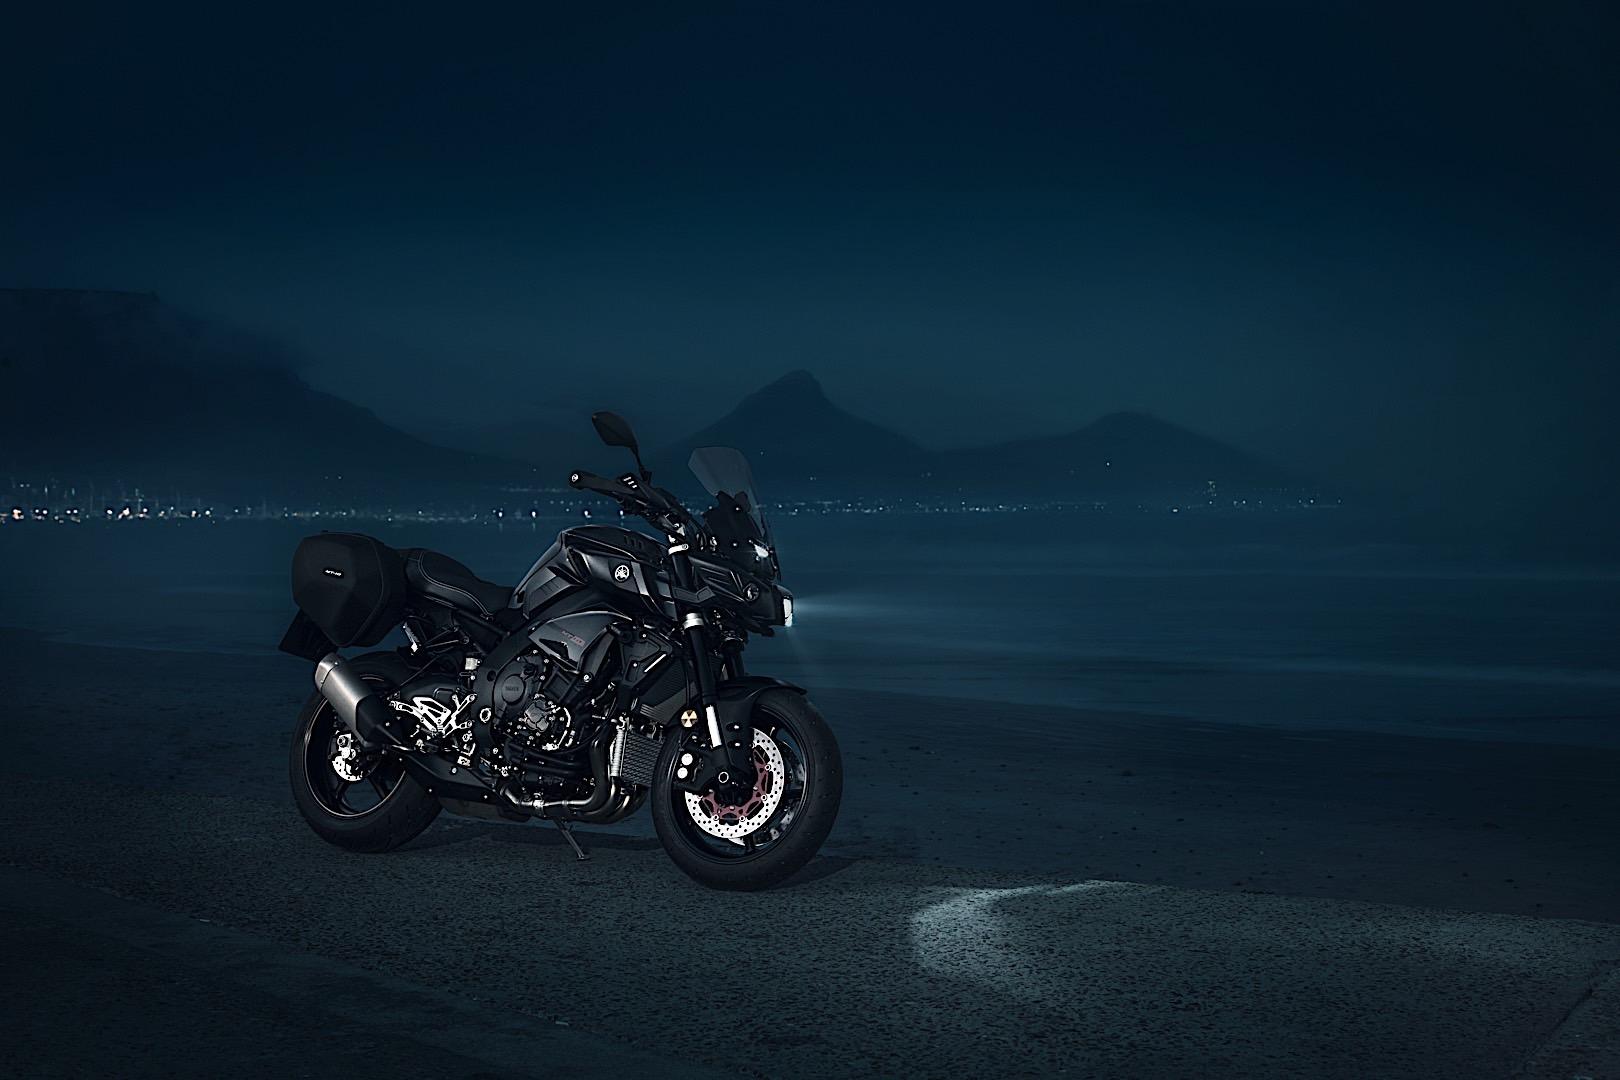 Motorok Yamaha MT-10 Tourer Edition (2017)